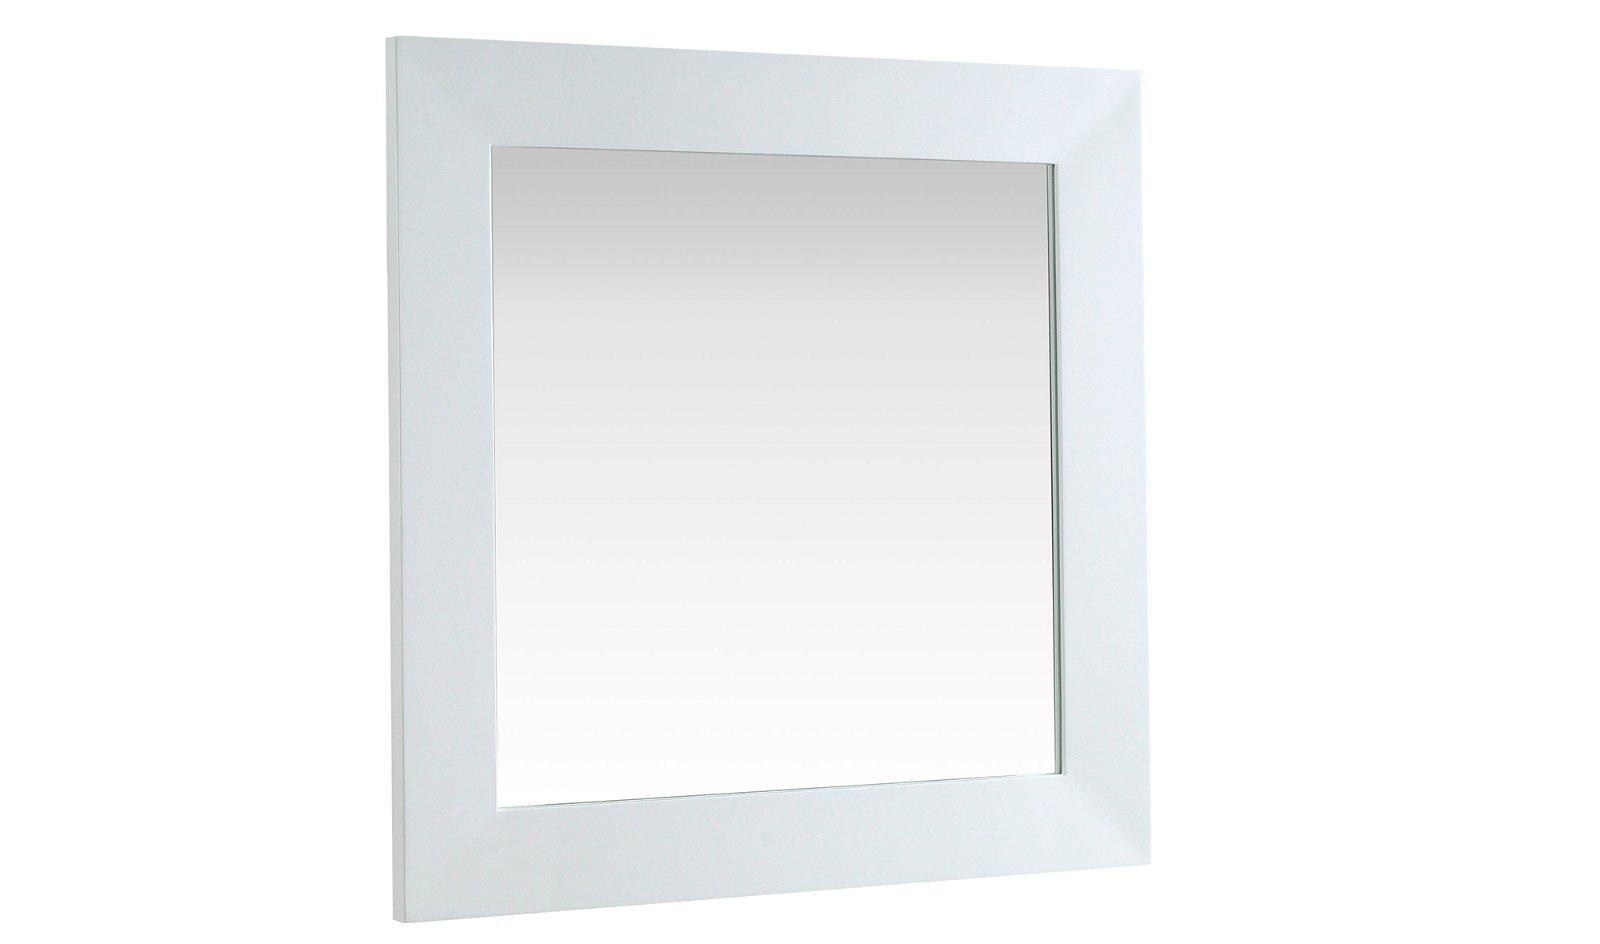 Espejo moderno blanco Hola